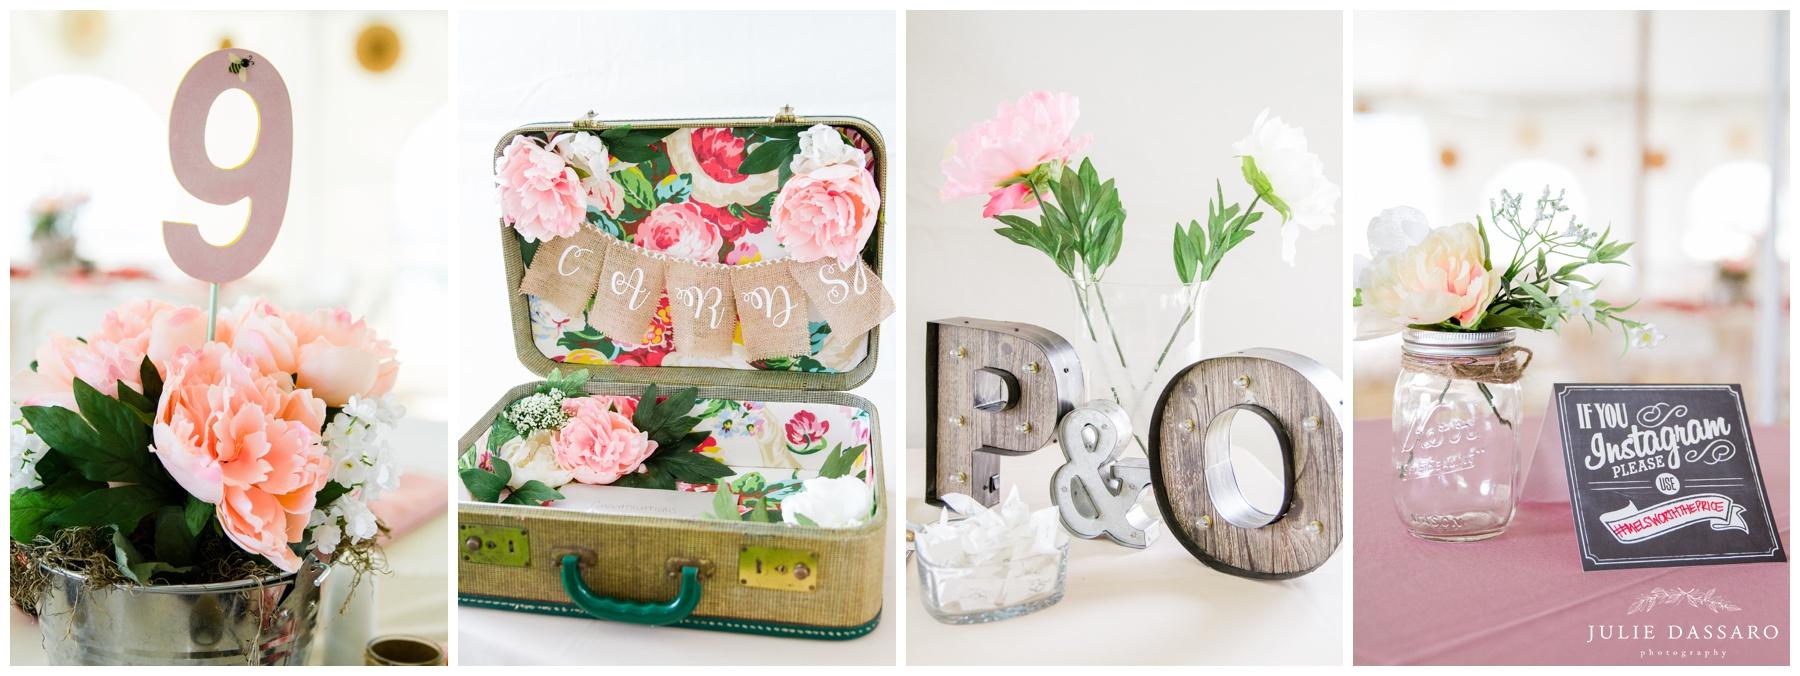 pretty wedding details in pink floral